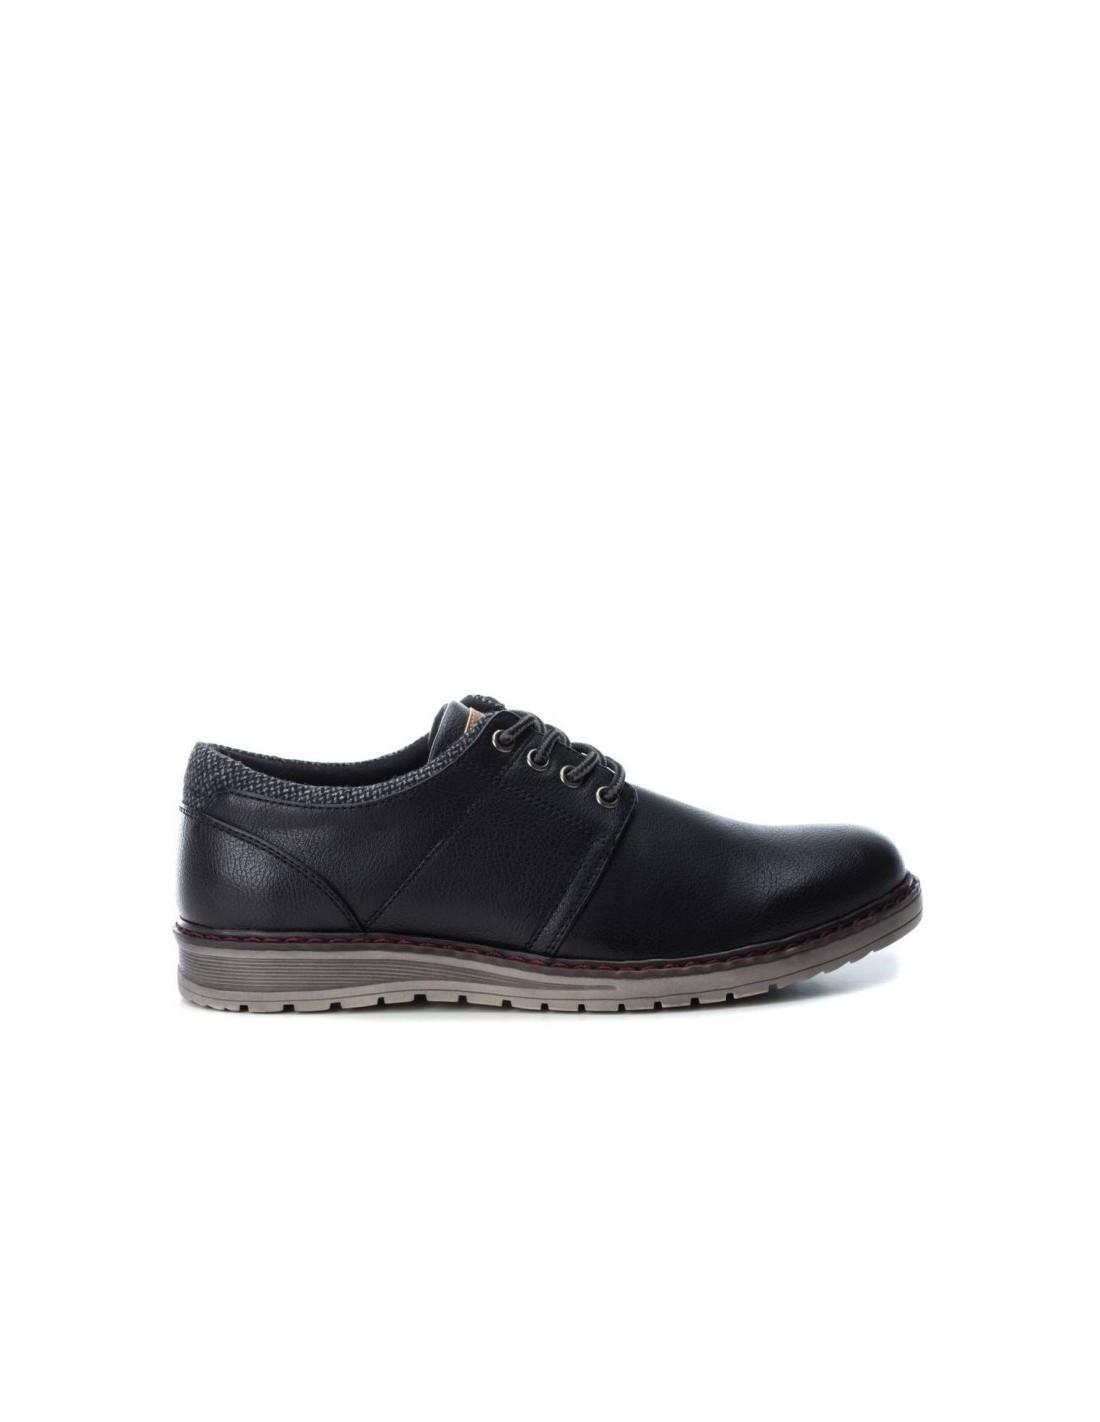 23ff8c9748b zapato de hombre de la marca xti suela goma antideslizante